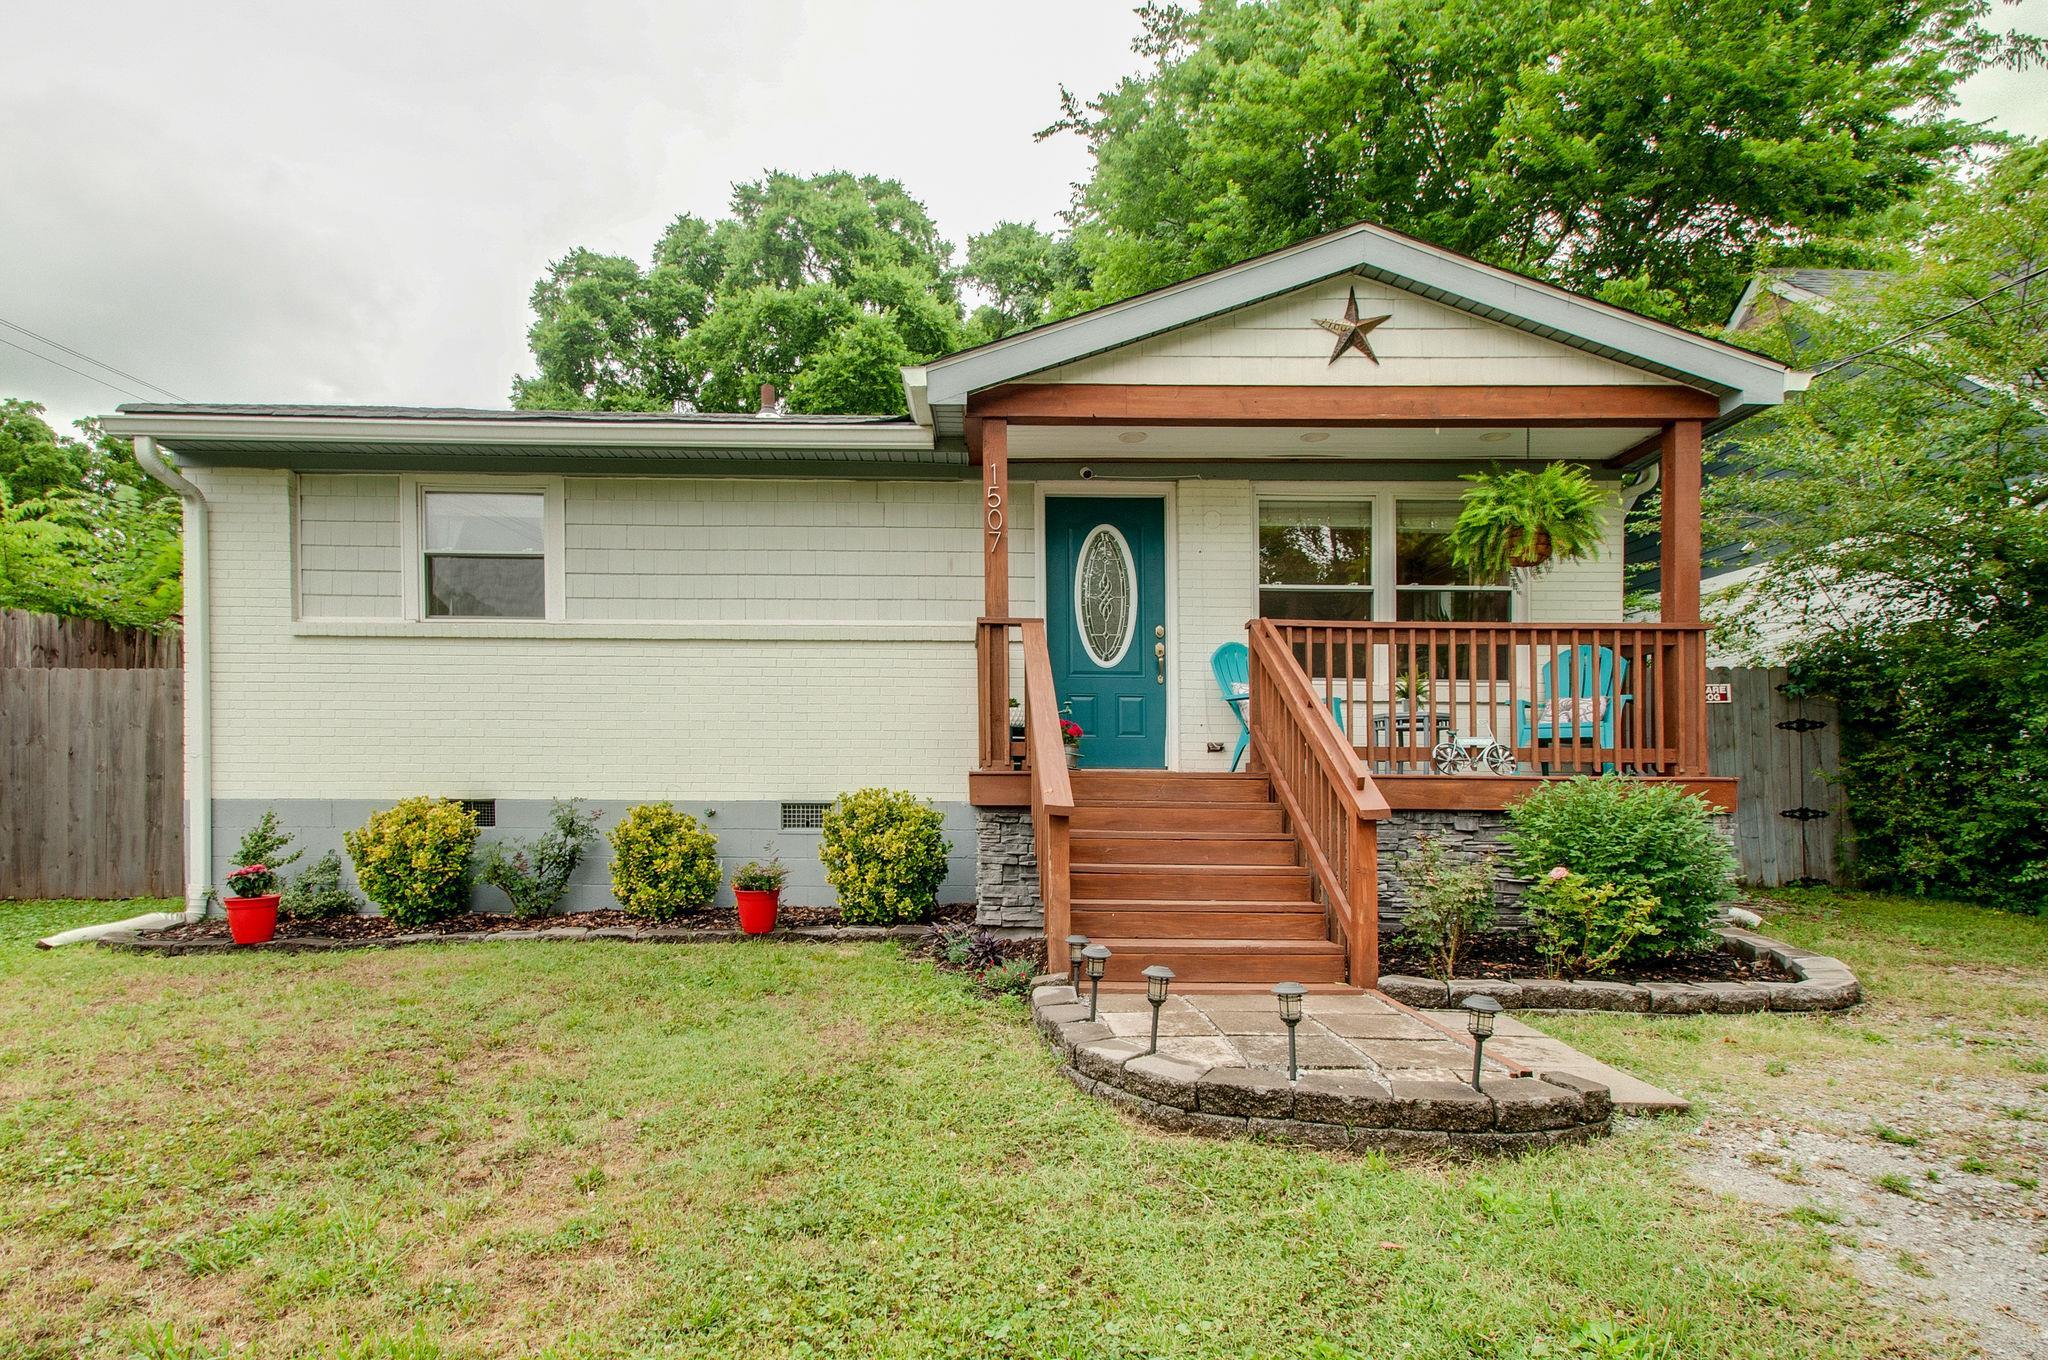 1507 Cahal Ave, Nashville, TN 37206 - Nashville, TN real estate listing